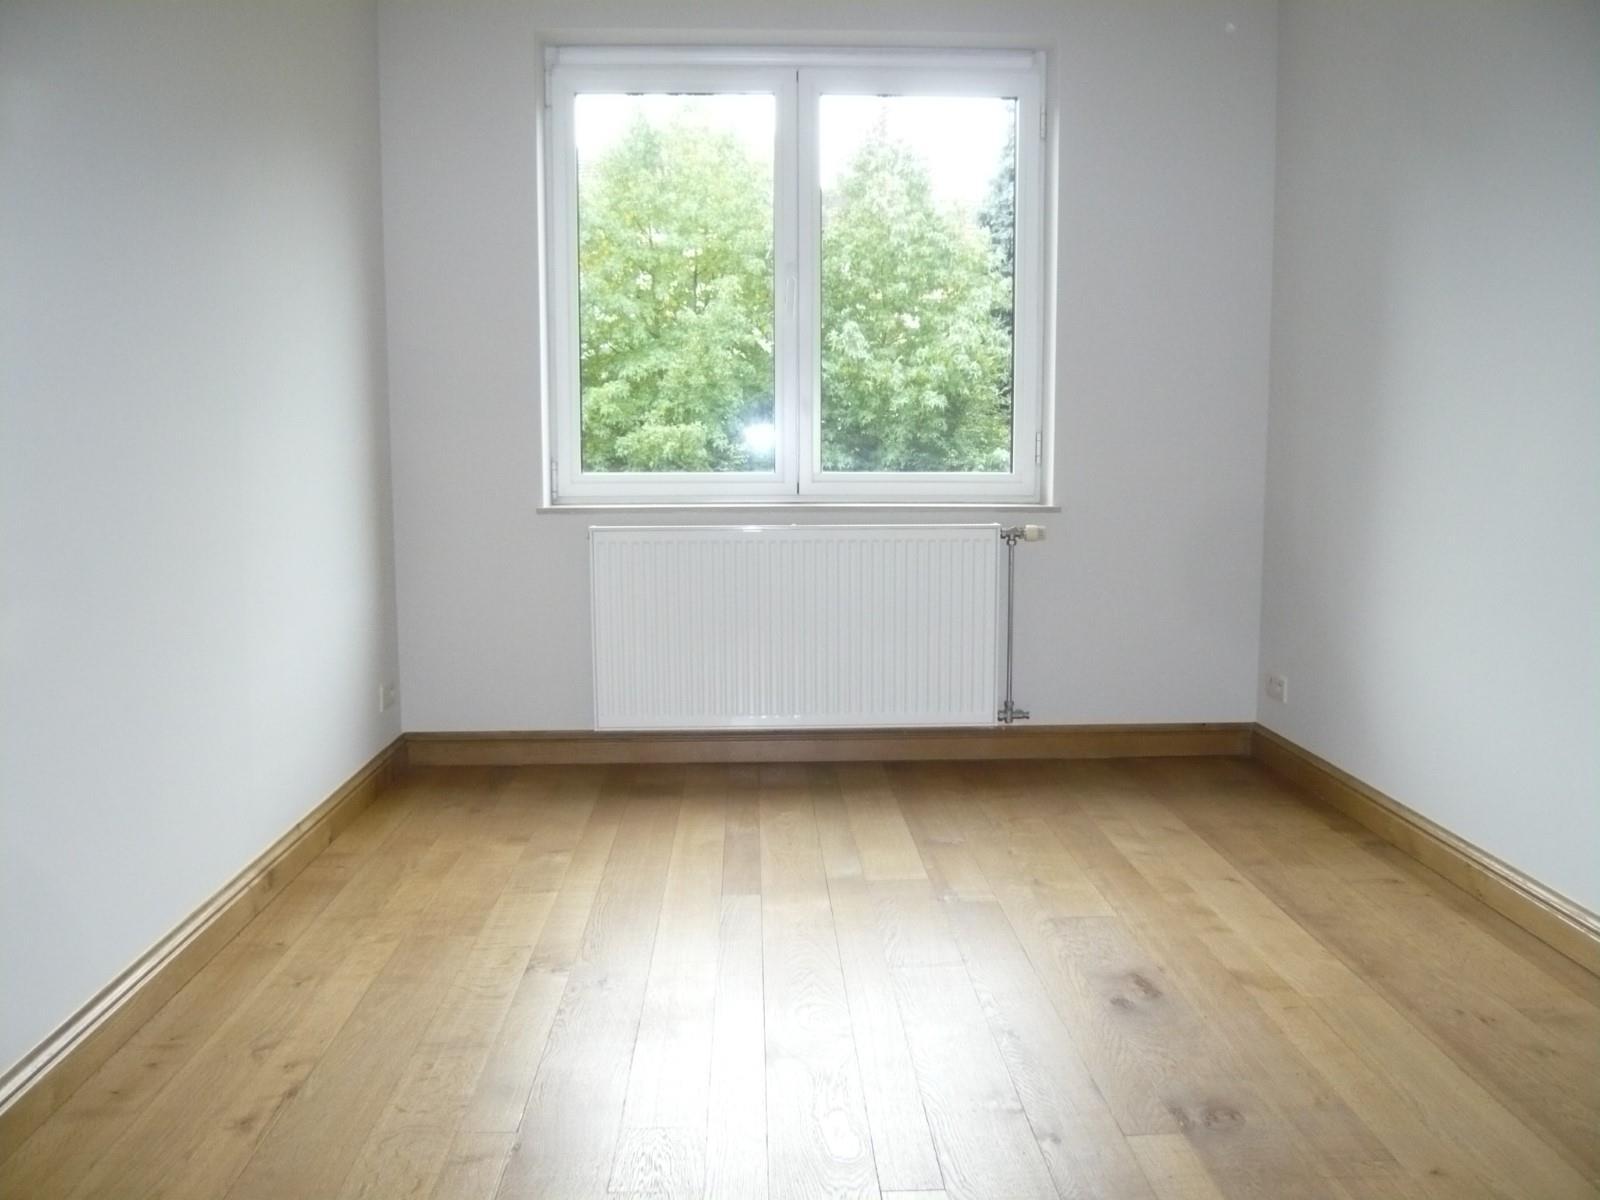 Appartement exceptionnel - Woluwe-Saint-Pierre - #2927607-7